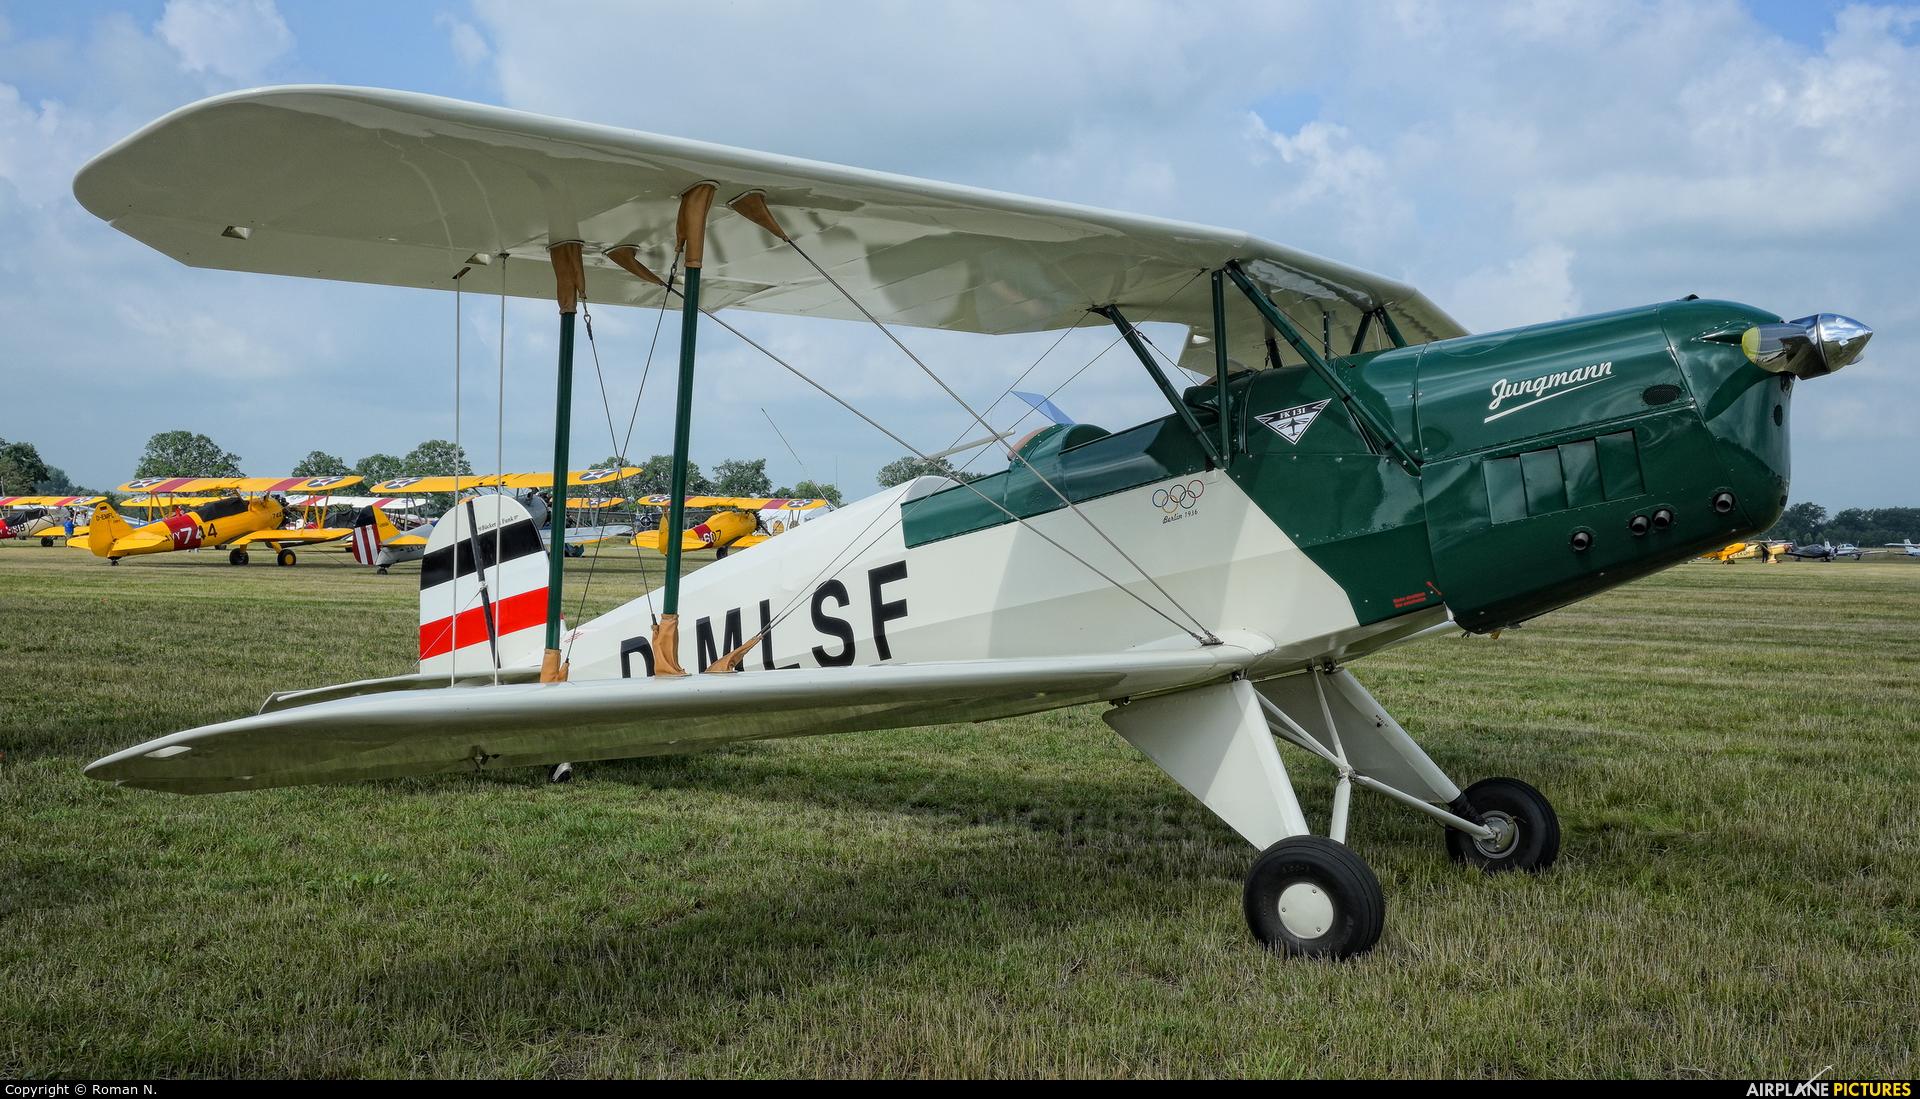 Private D-MLSF aircraft at Bienenfarm